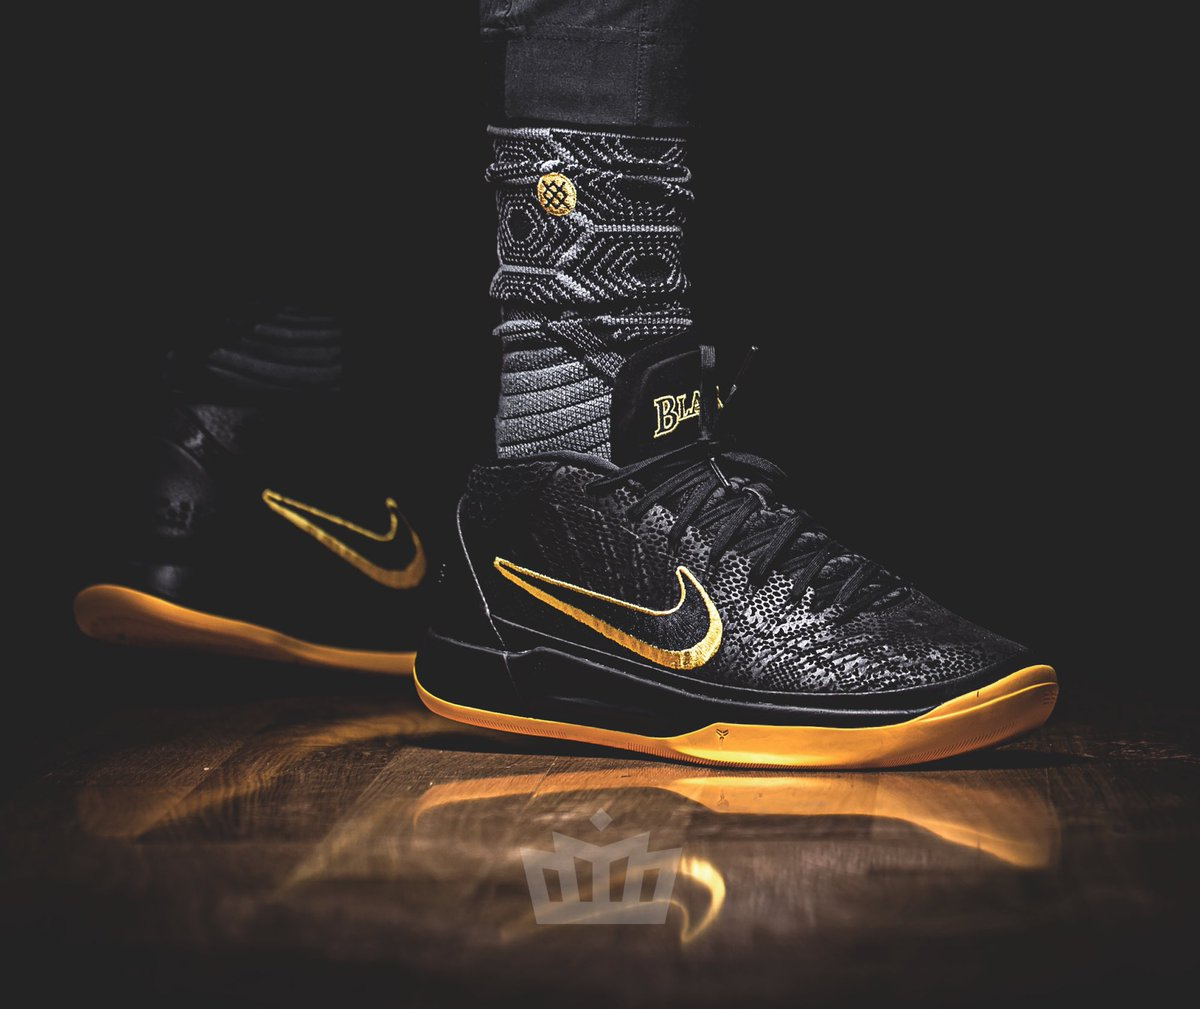 Nike Kobe A.D. Black Mamba